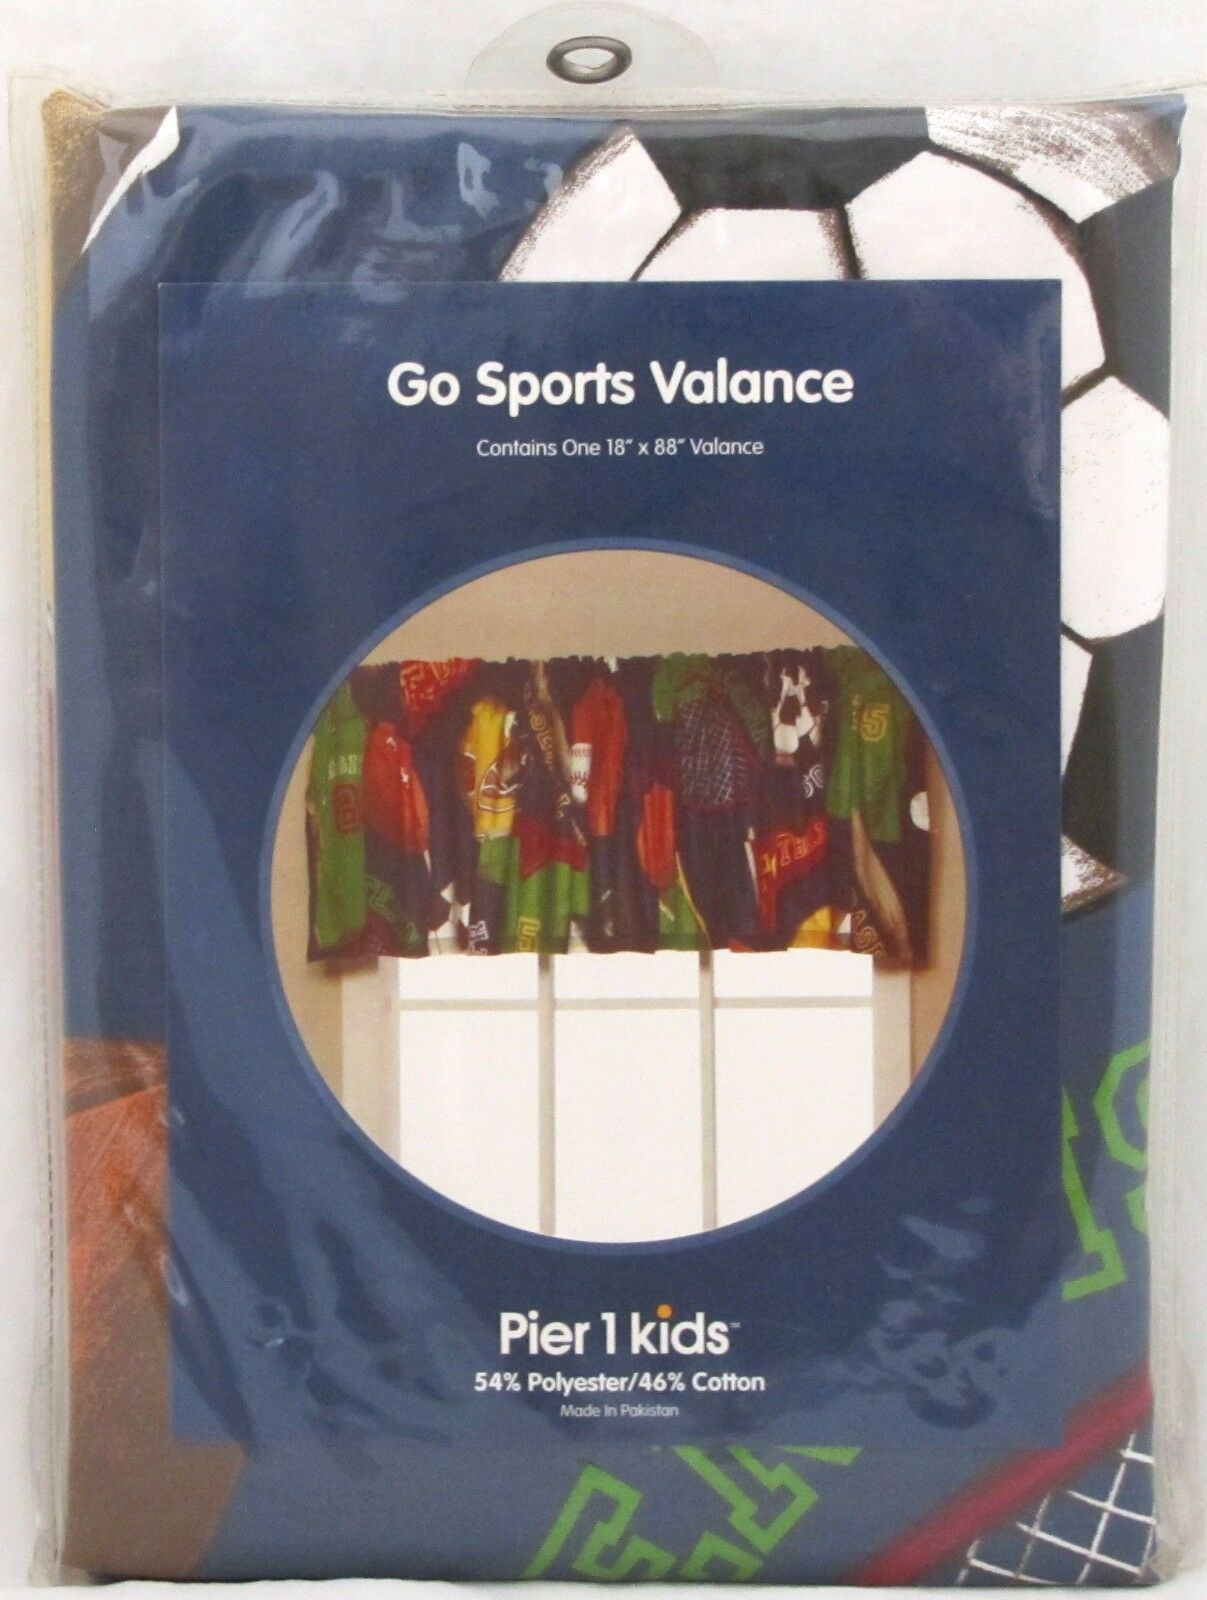 Pier 1 Kids Go Sports Window Valance One 18 X 88 Boy S Bedroom Brand New For Sale Online